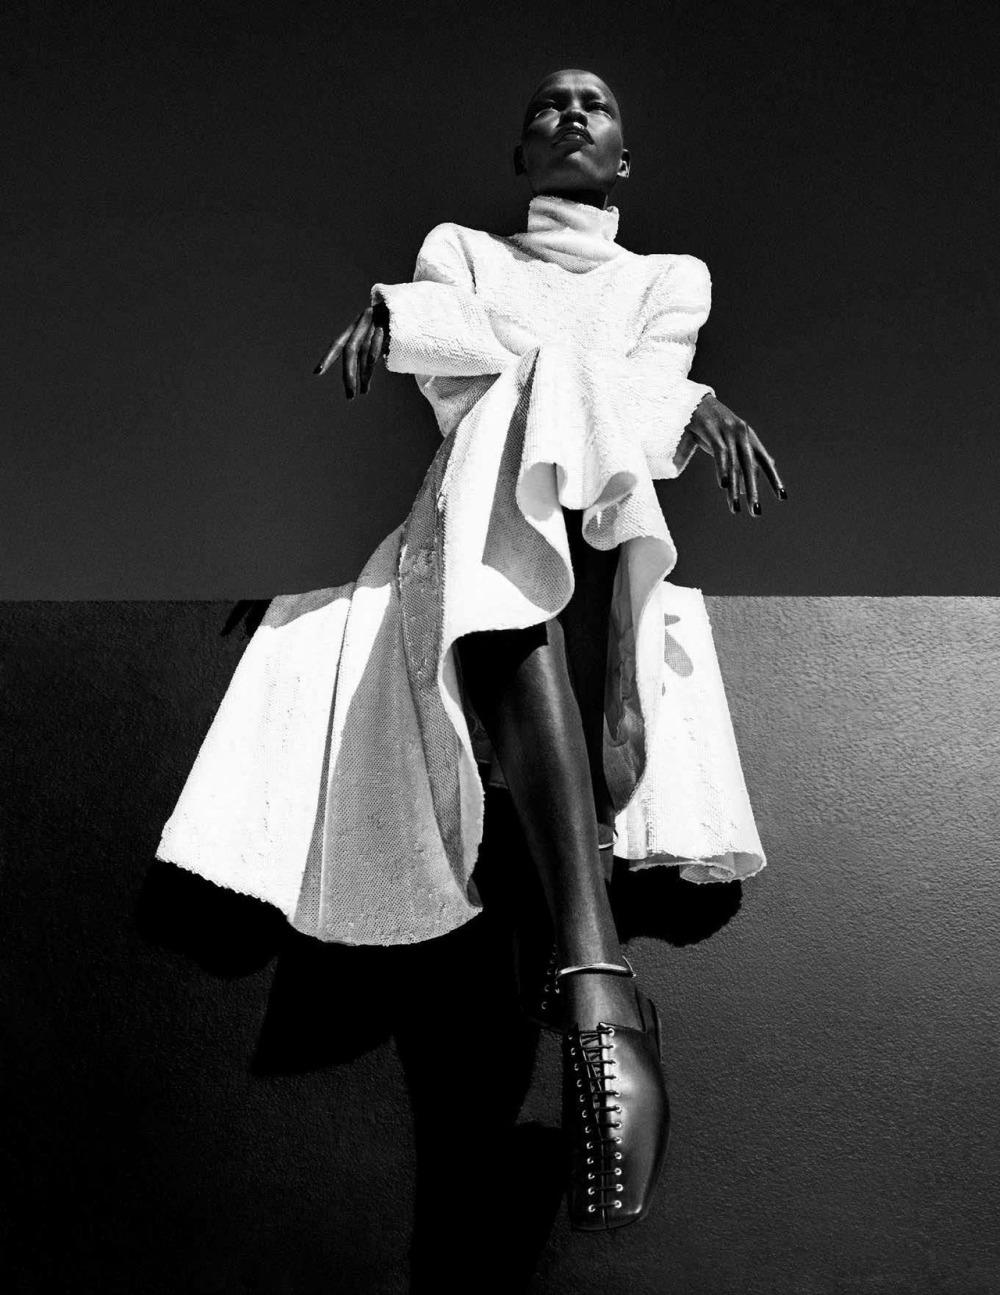 Vogue时尚杂志德国版2018年五月刊摄影师Giampaolo Sgura时尚杂志大片:天然美女